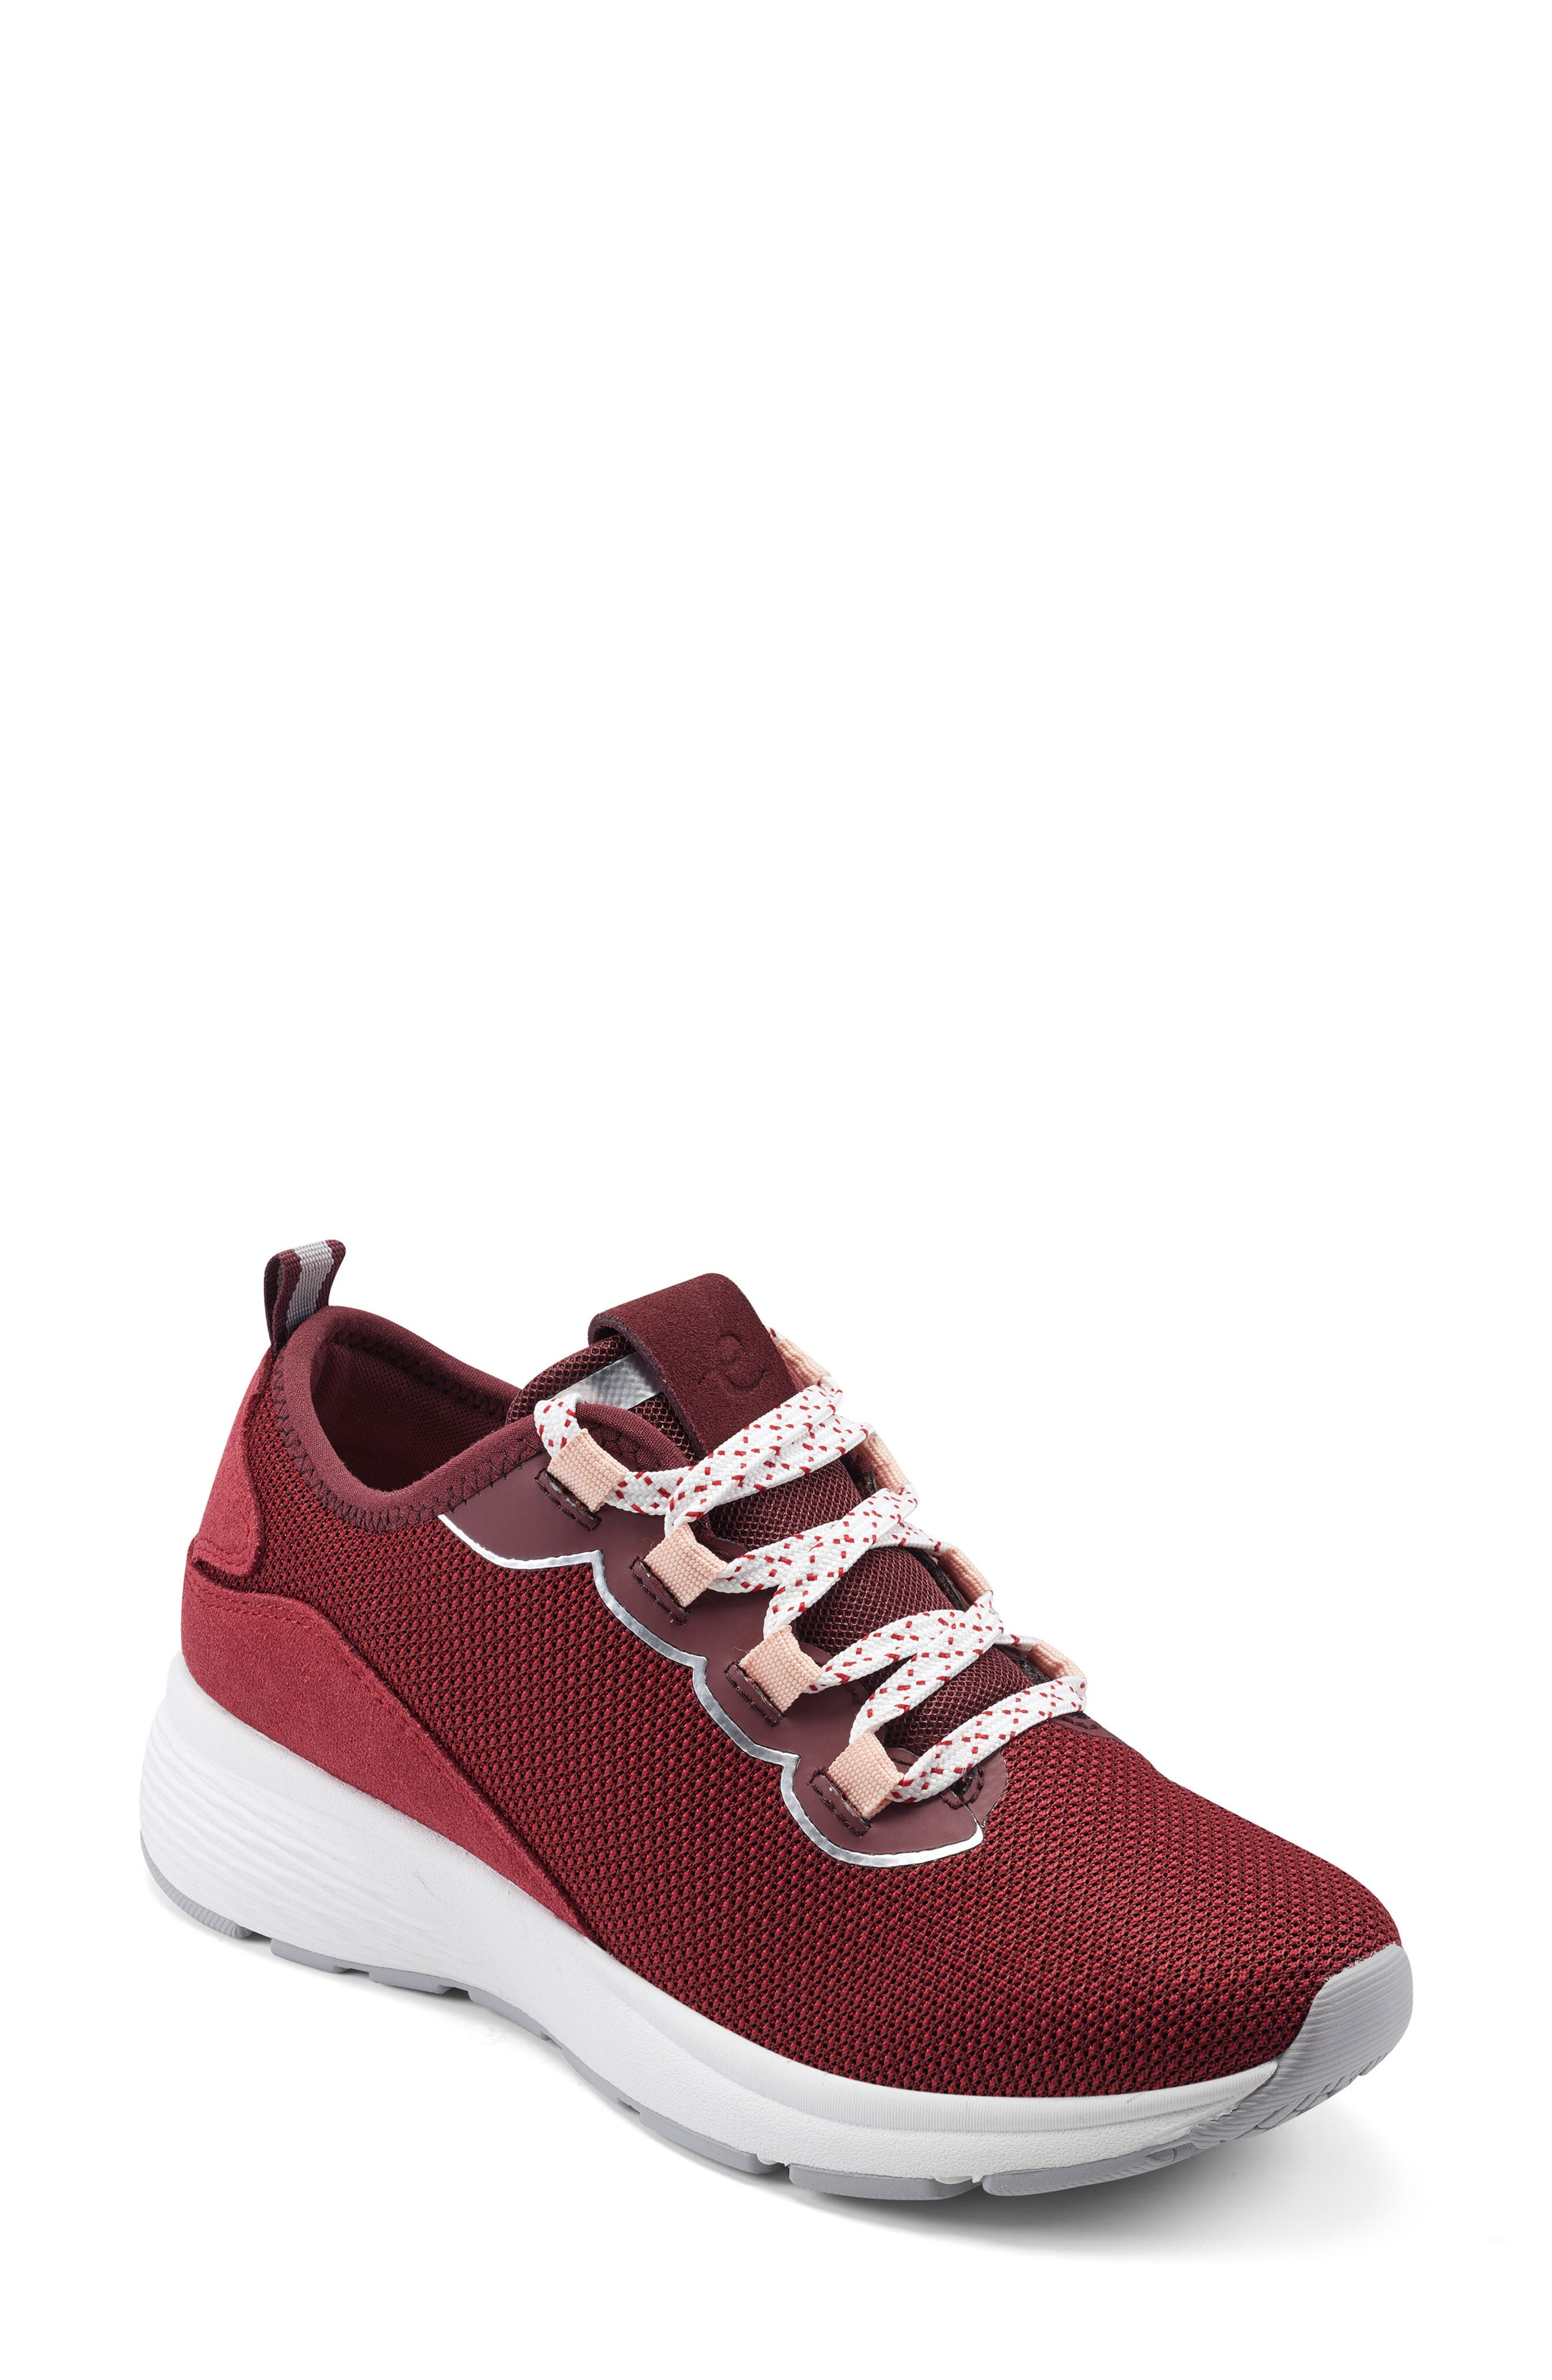 Skip Sneaker